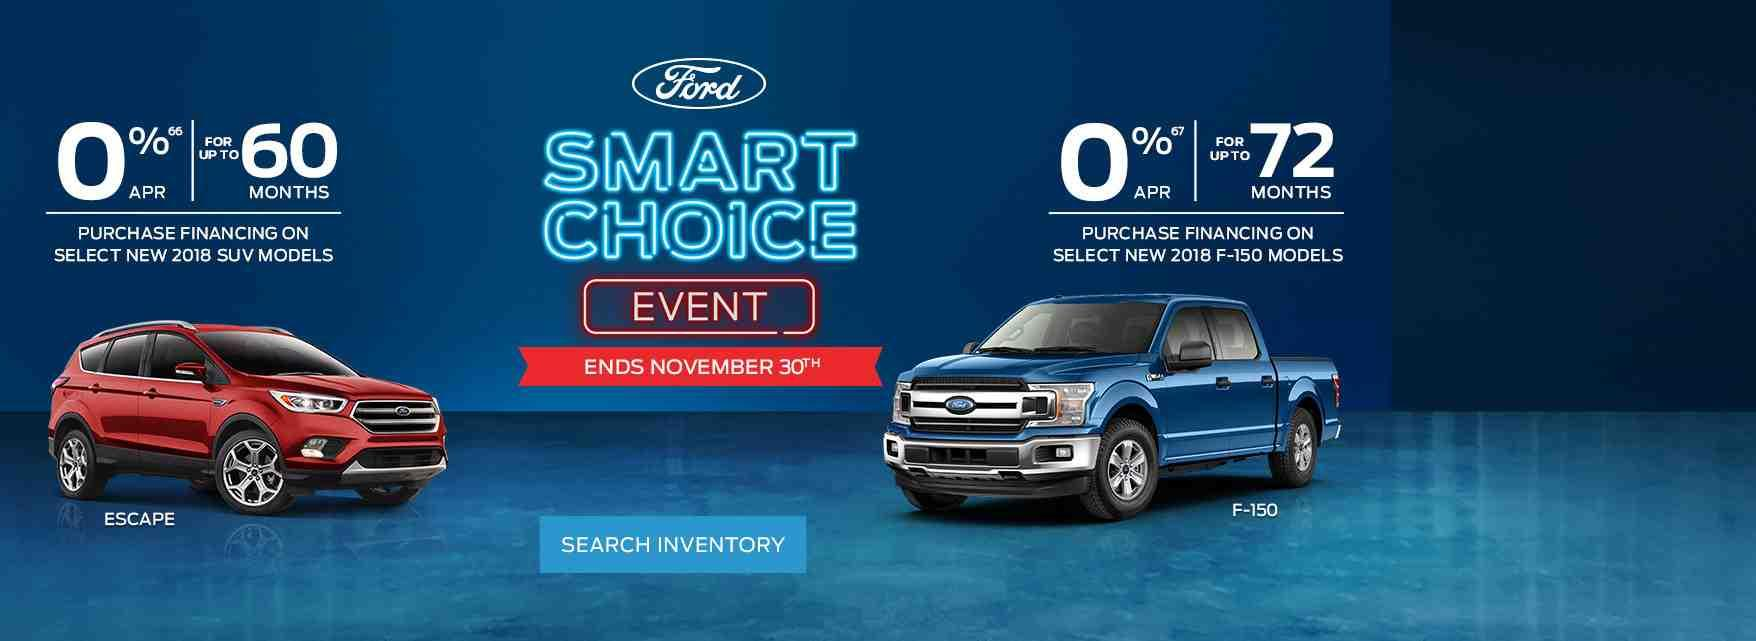 smart choice event